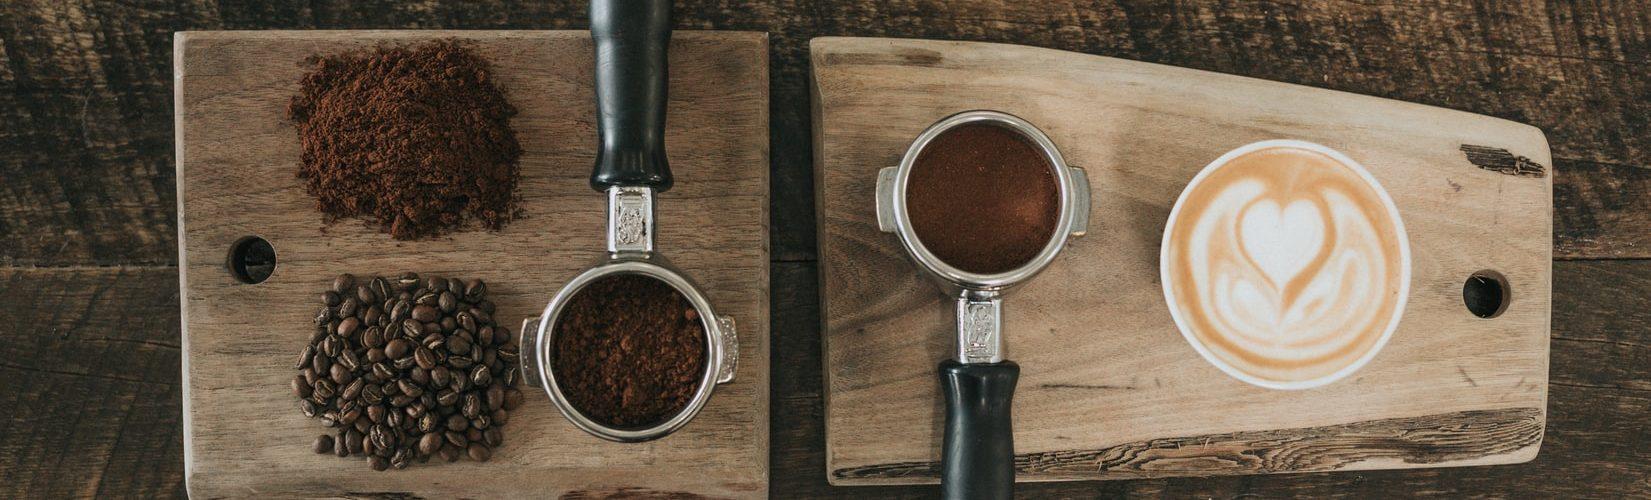 koffie-pers